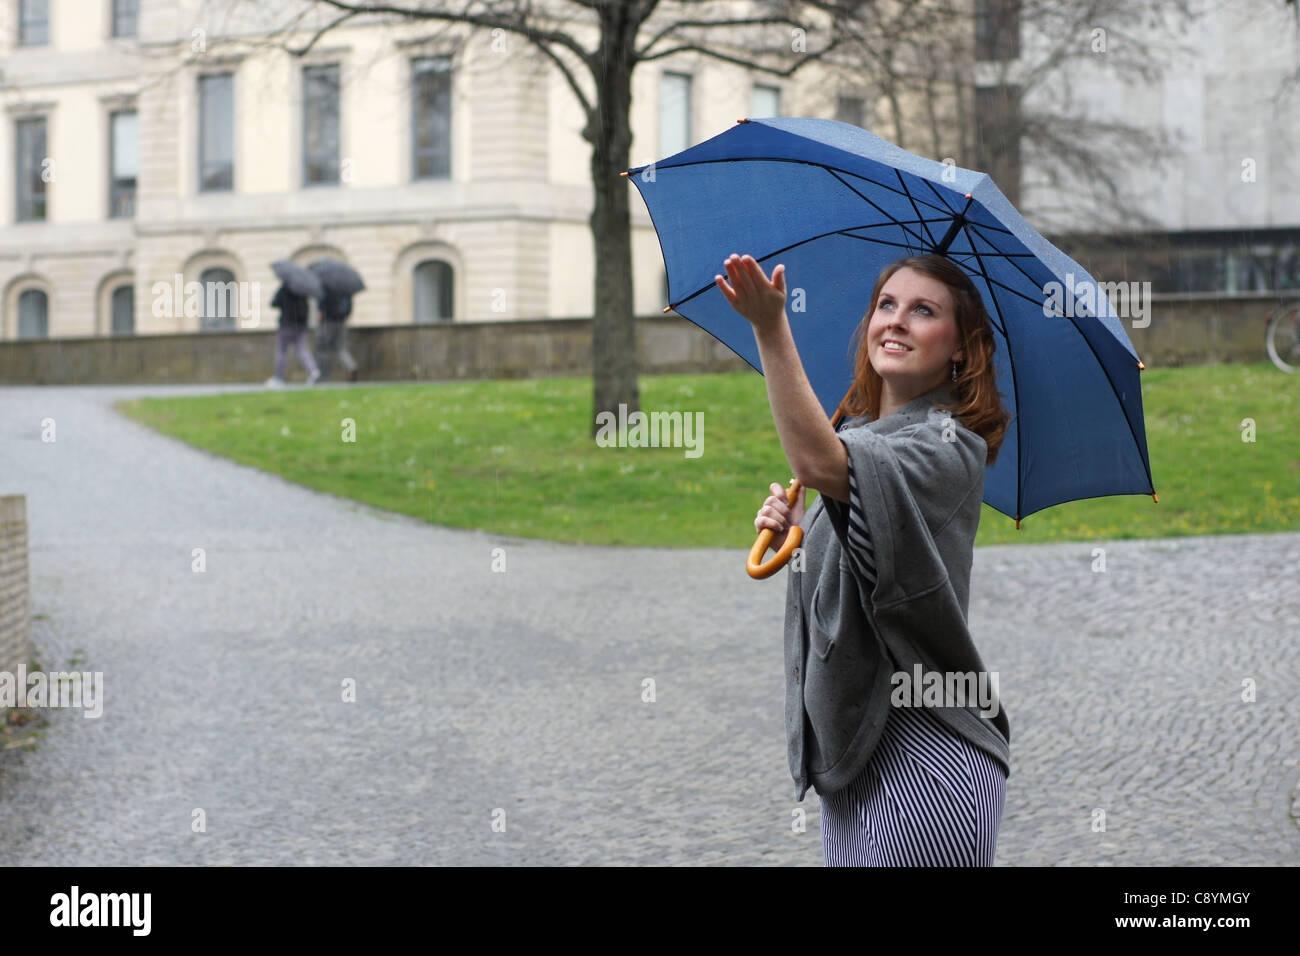 young woman with umbrella enjoying the rain Stock Photo